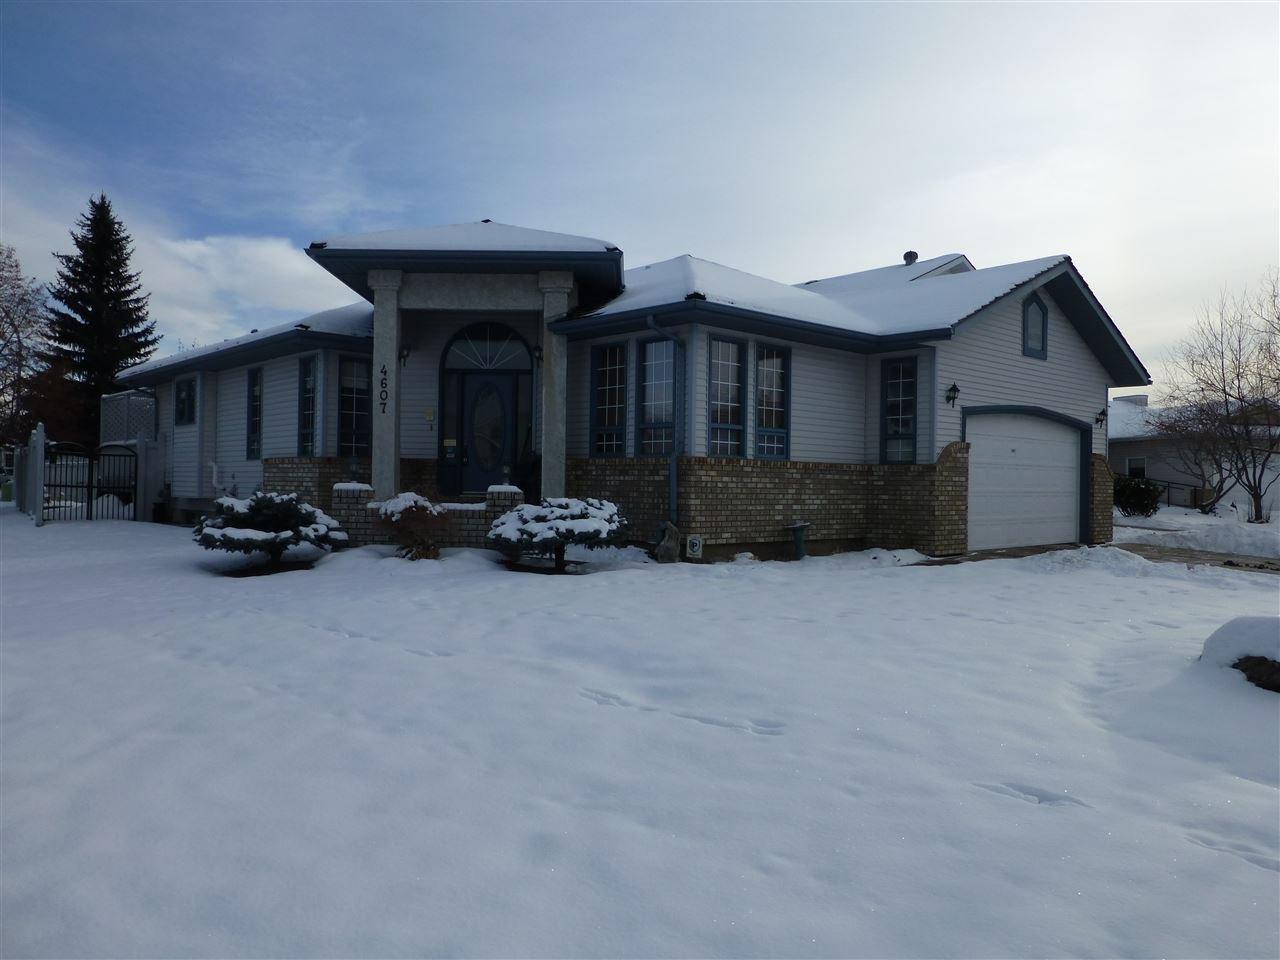 Main Photo: 4607 43A Avenue in Edmonton: Zone 29 House for sale : MLS®# E4182913